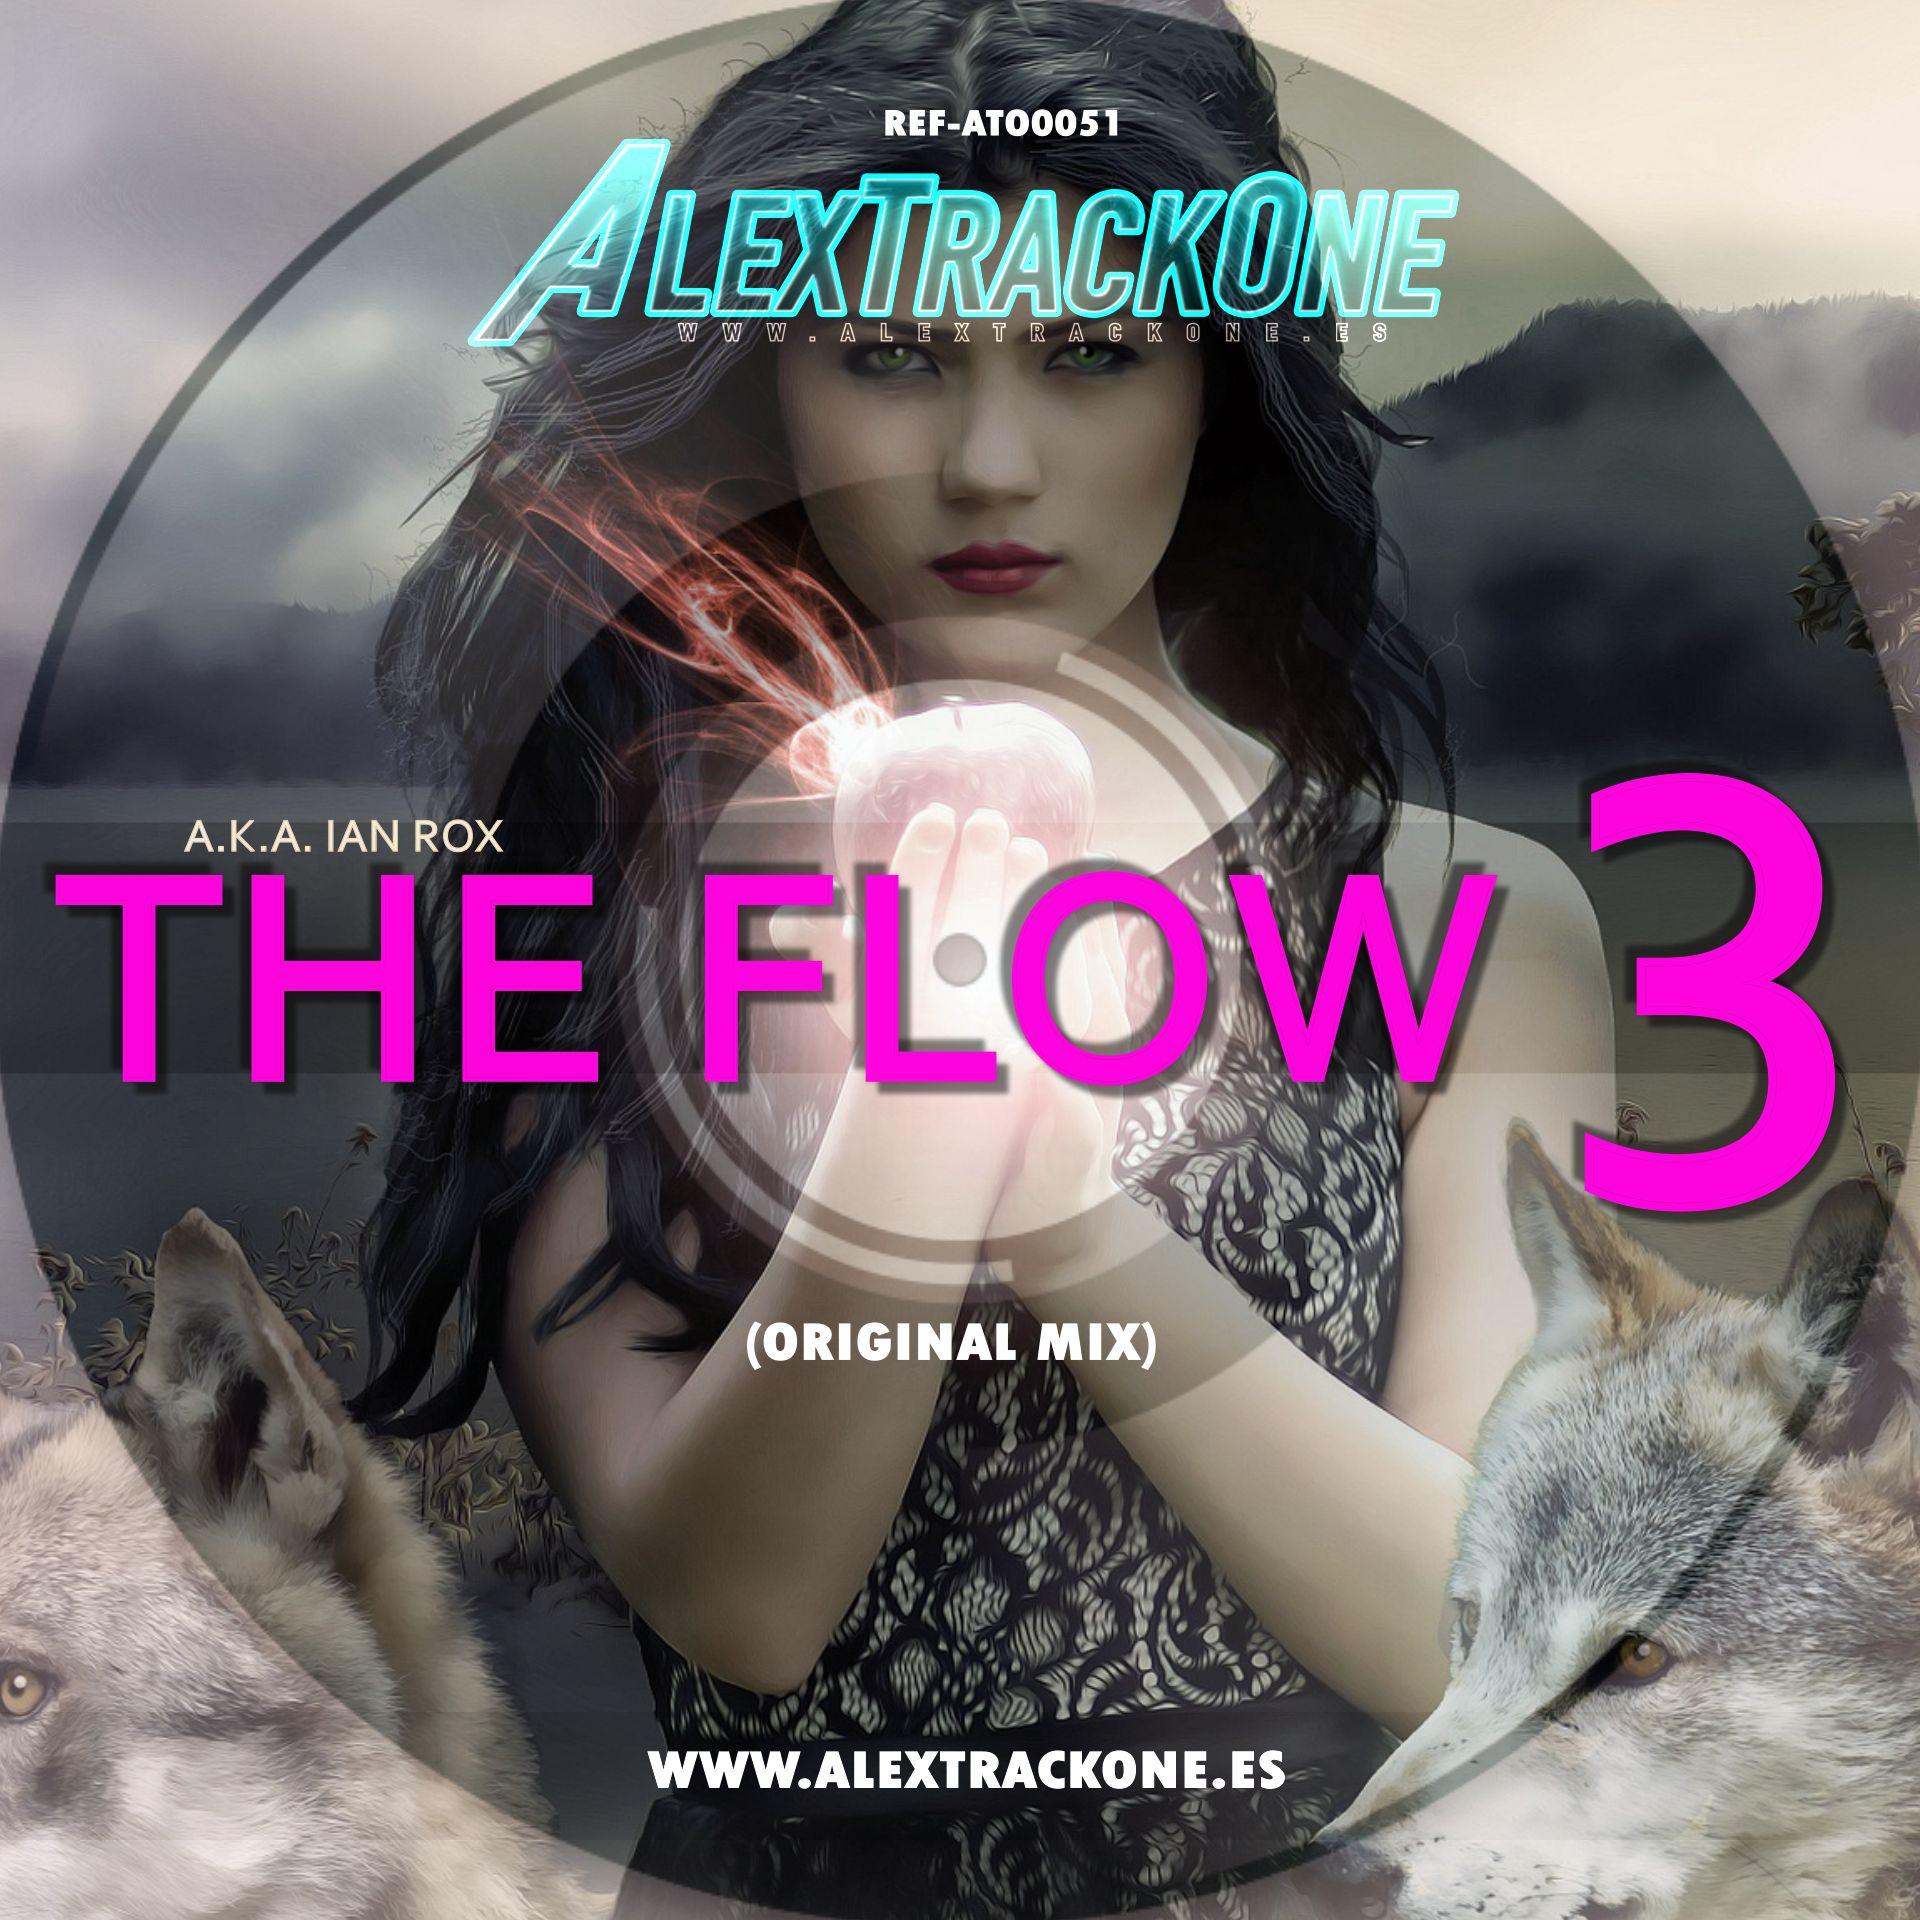 REF-ATO0051 AKA IAN ROX - THE FLOW 3 (ORIGINAL MIX) (MP3 & WAV)